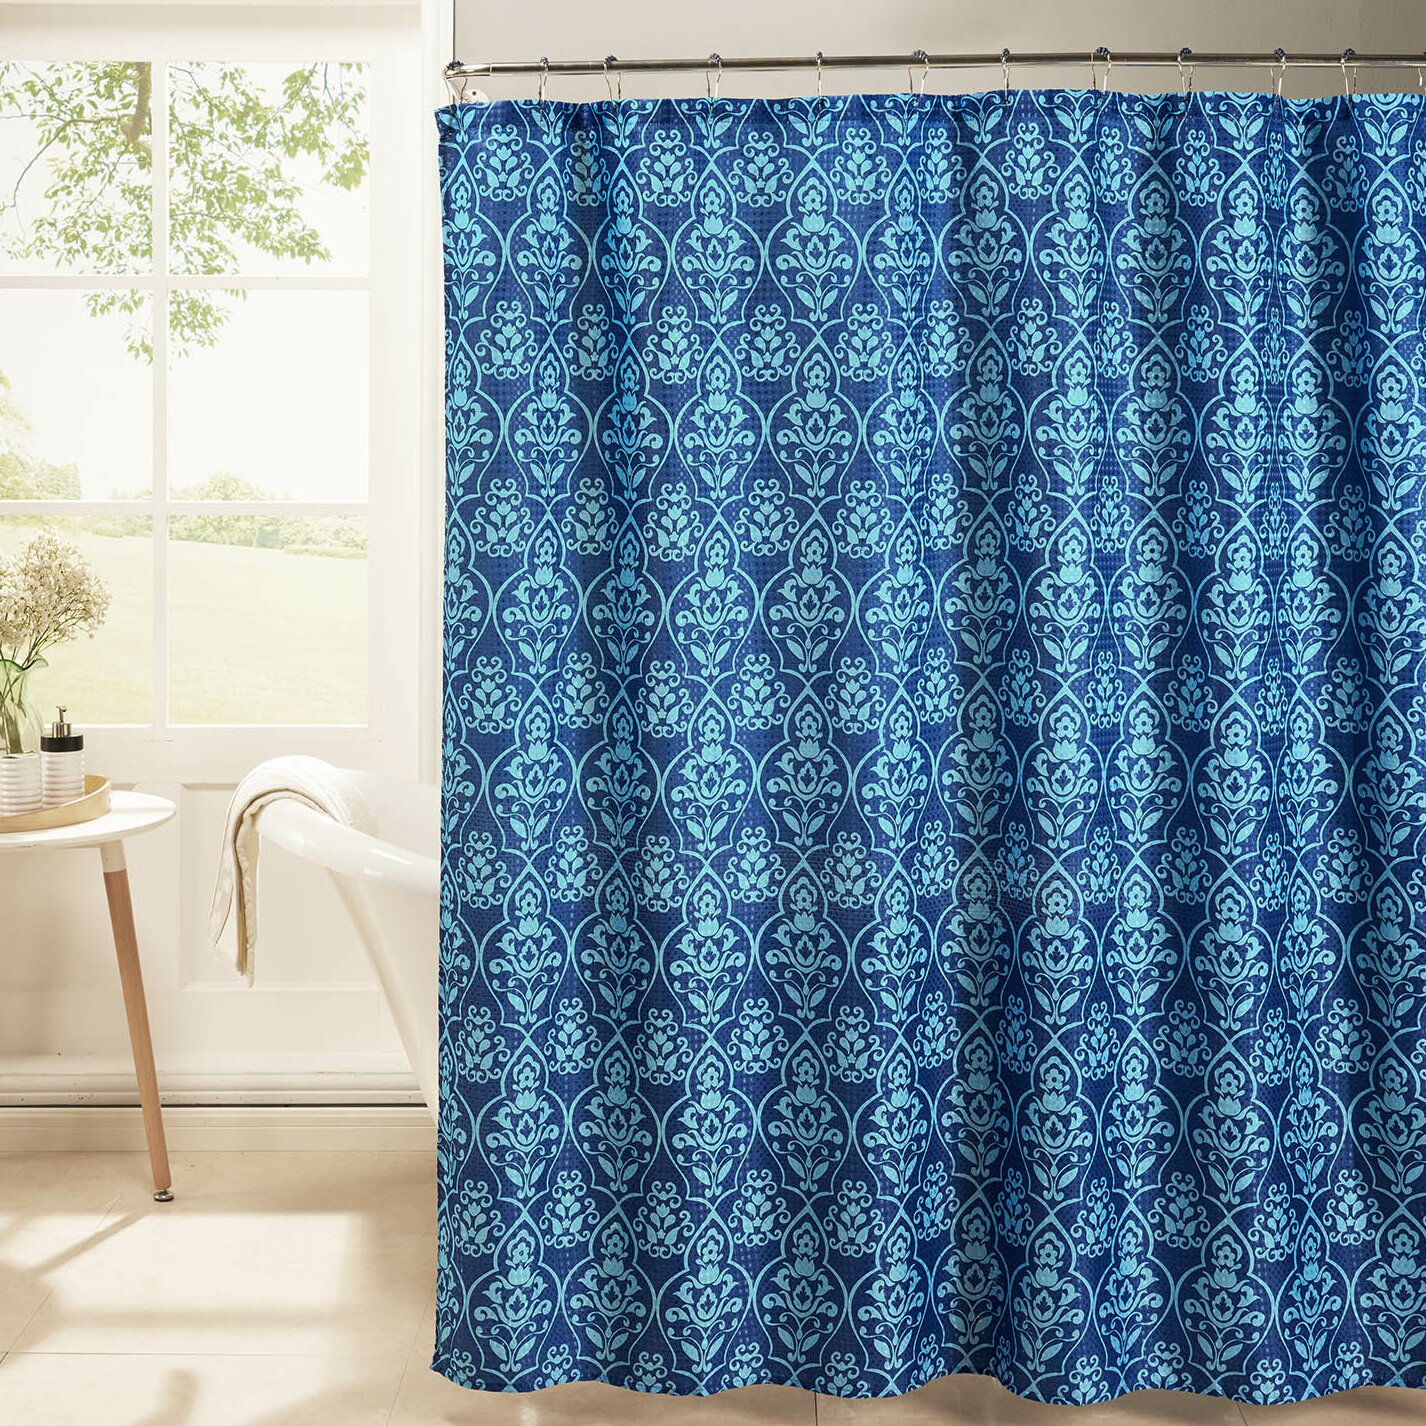 Bath Studio Oxford Weave Textured Shower Curtain Set